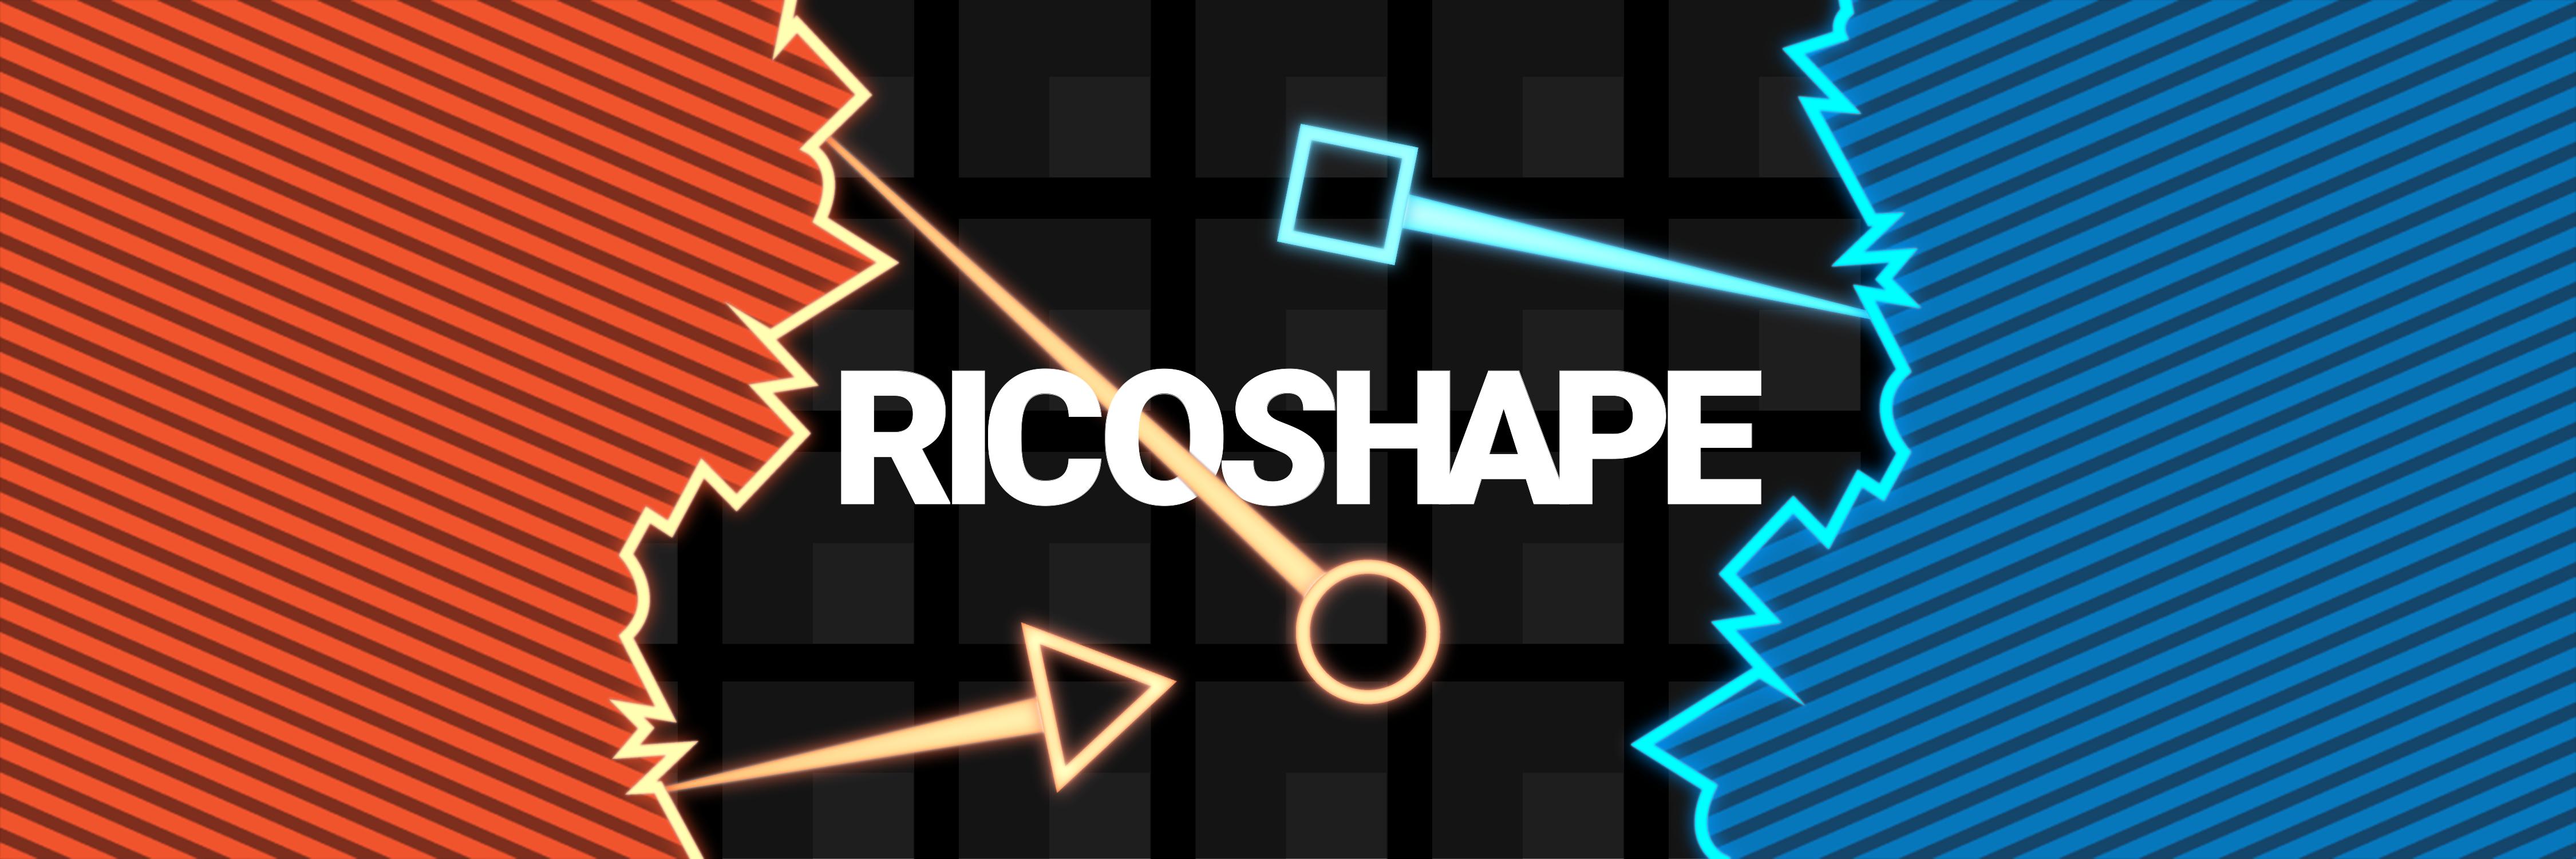 Ricoshape